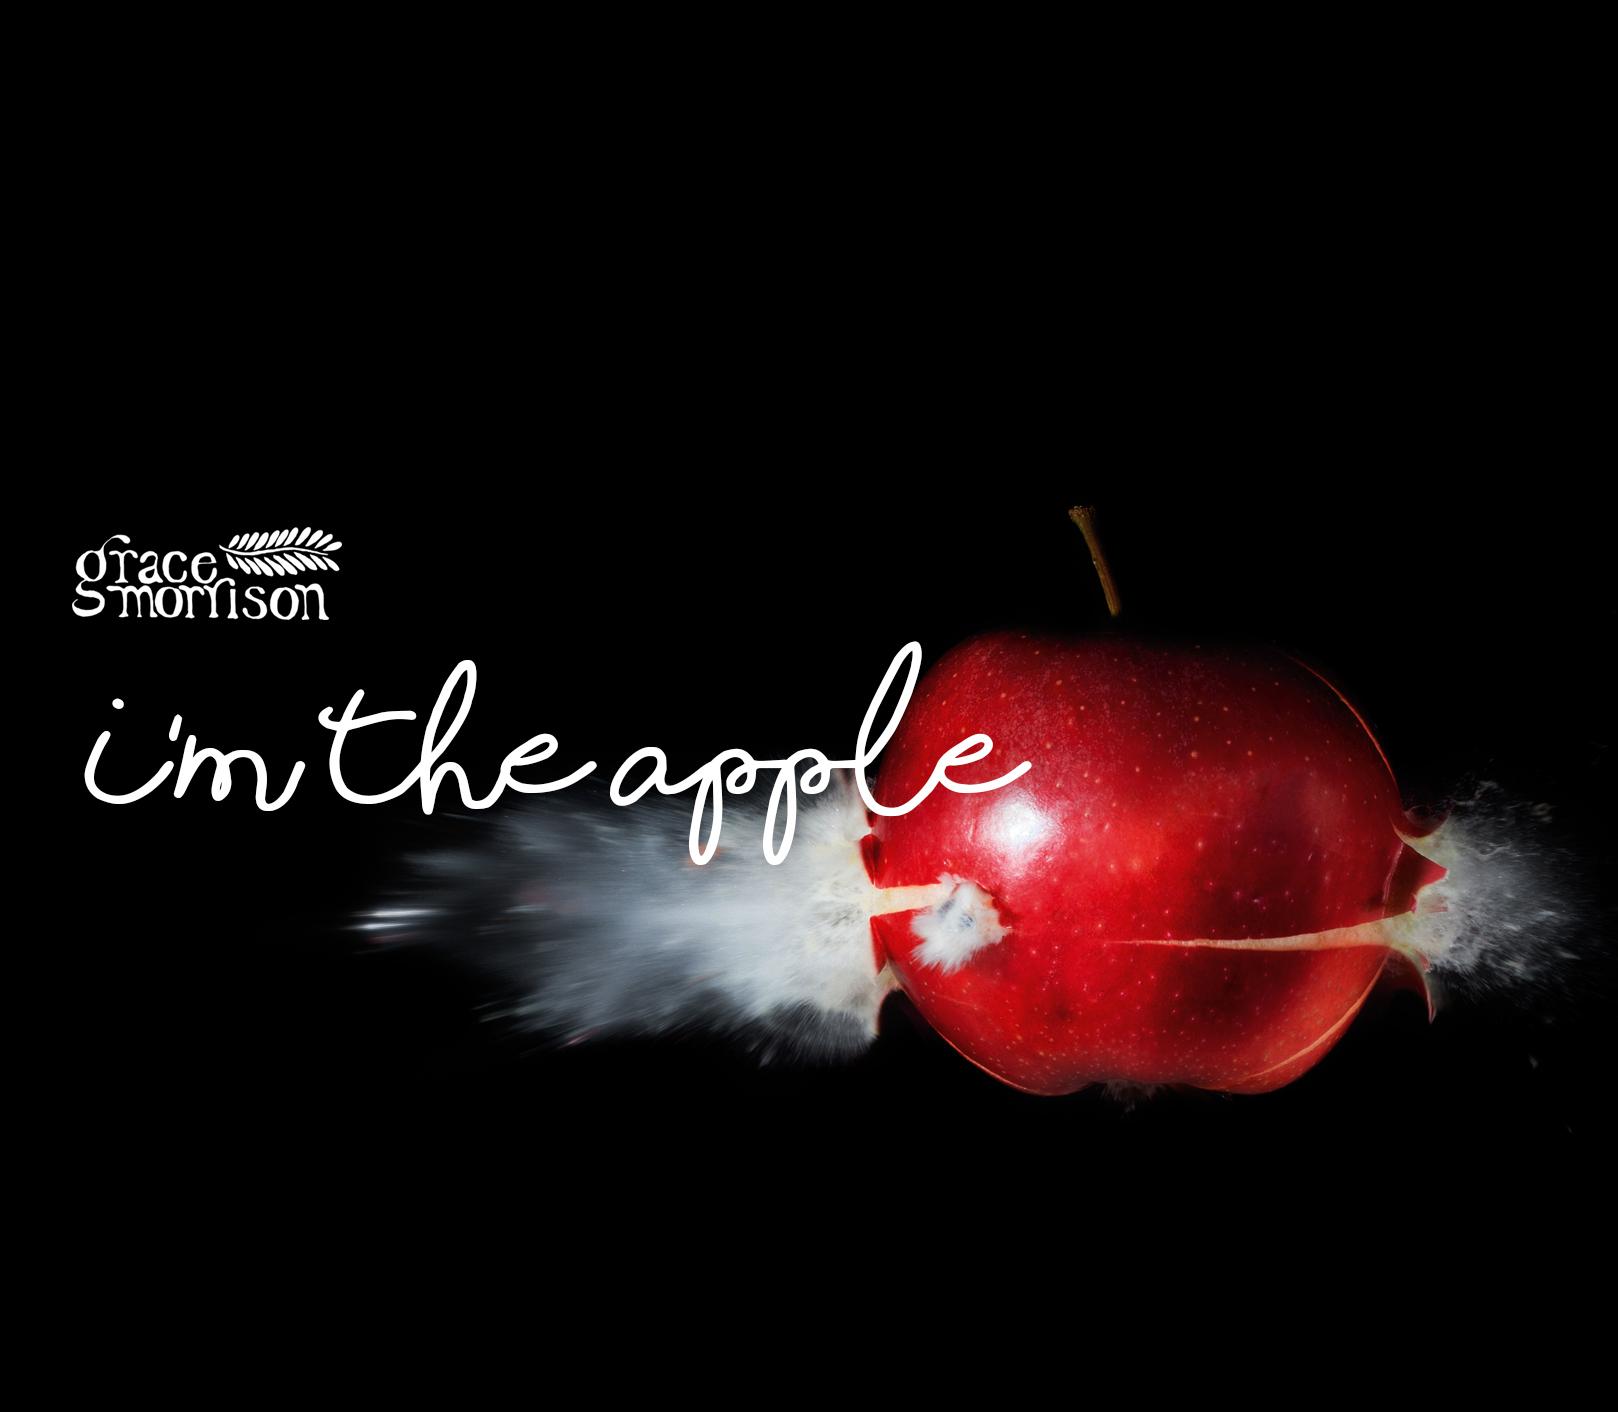 I'm the Apple.jpg